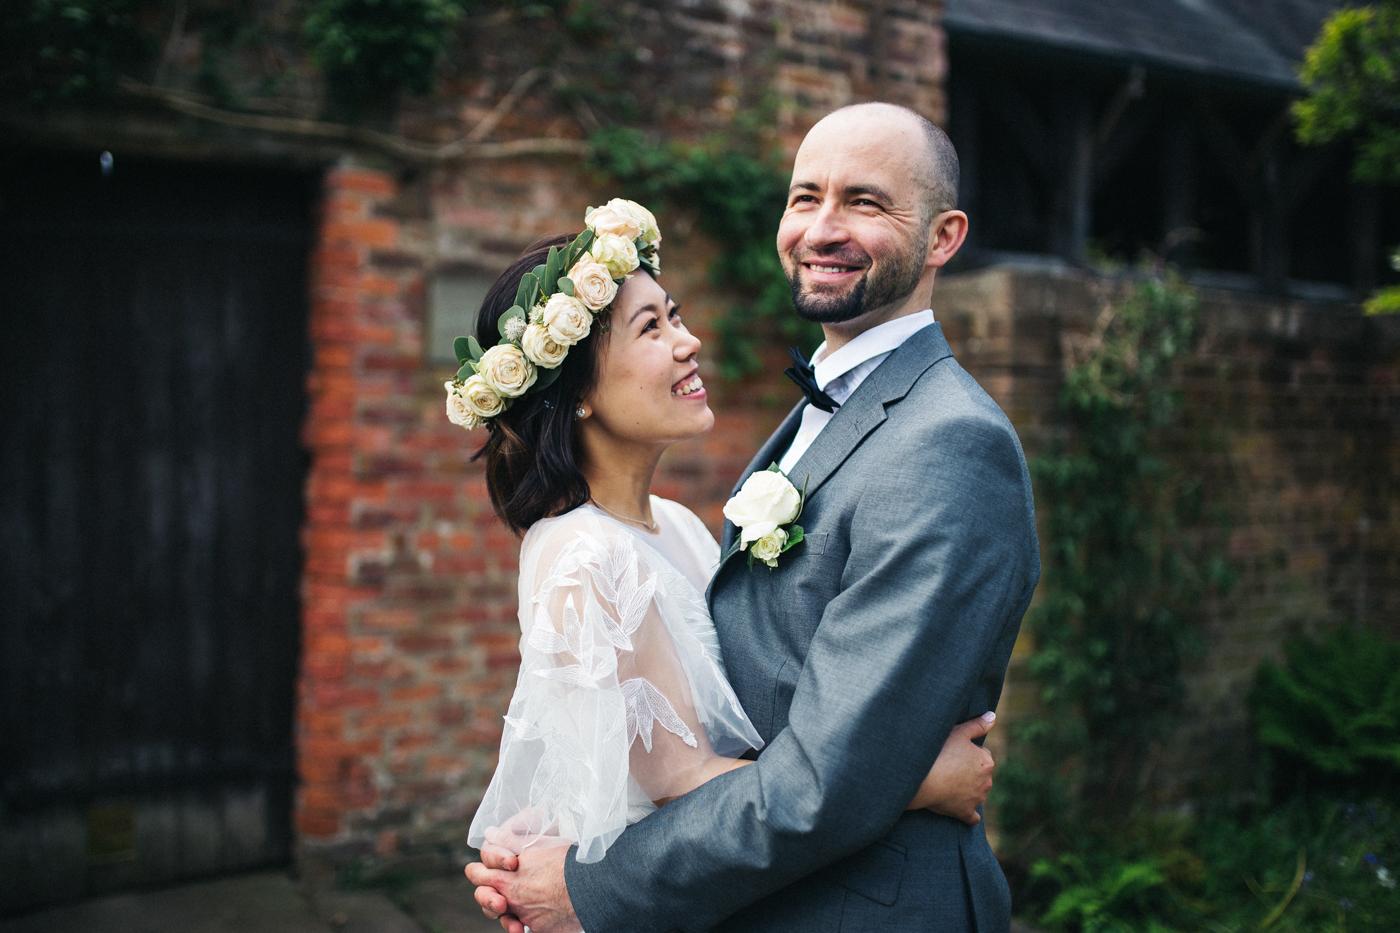 teesside-middlesbrough-north-east-wedding-photographer-creative-wedding-venues-0036.jpg